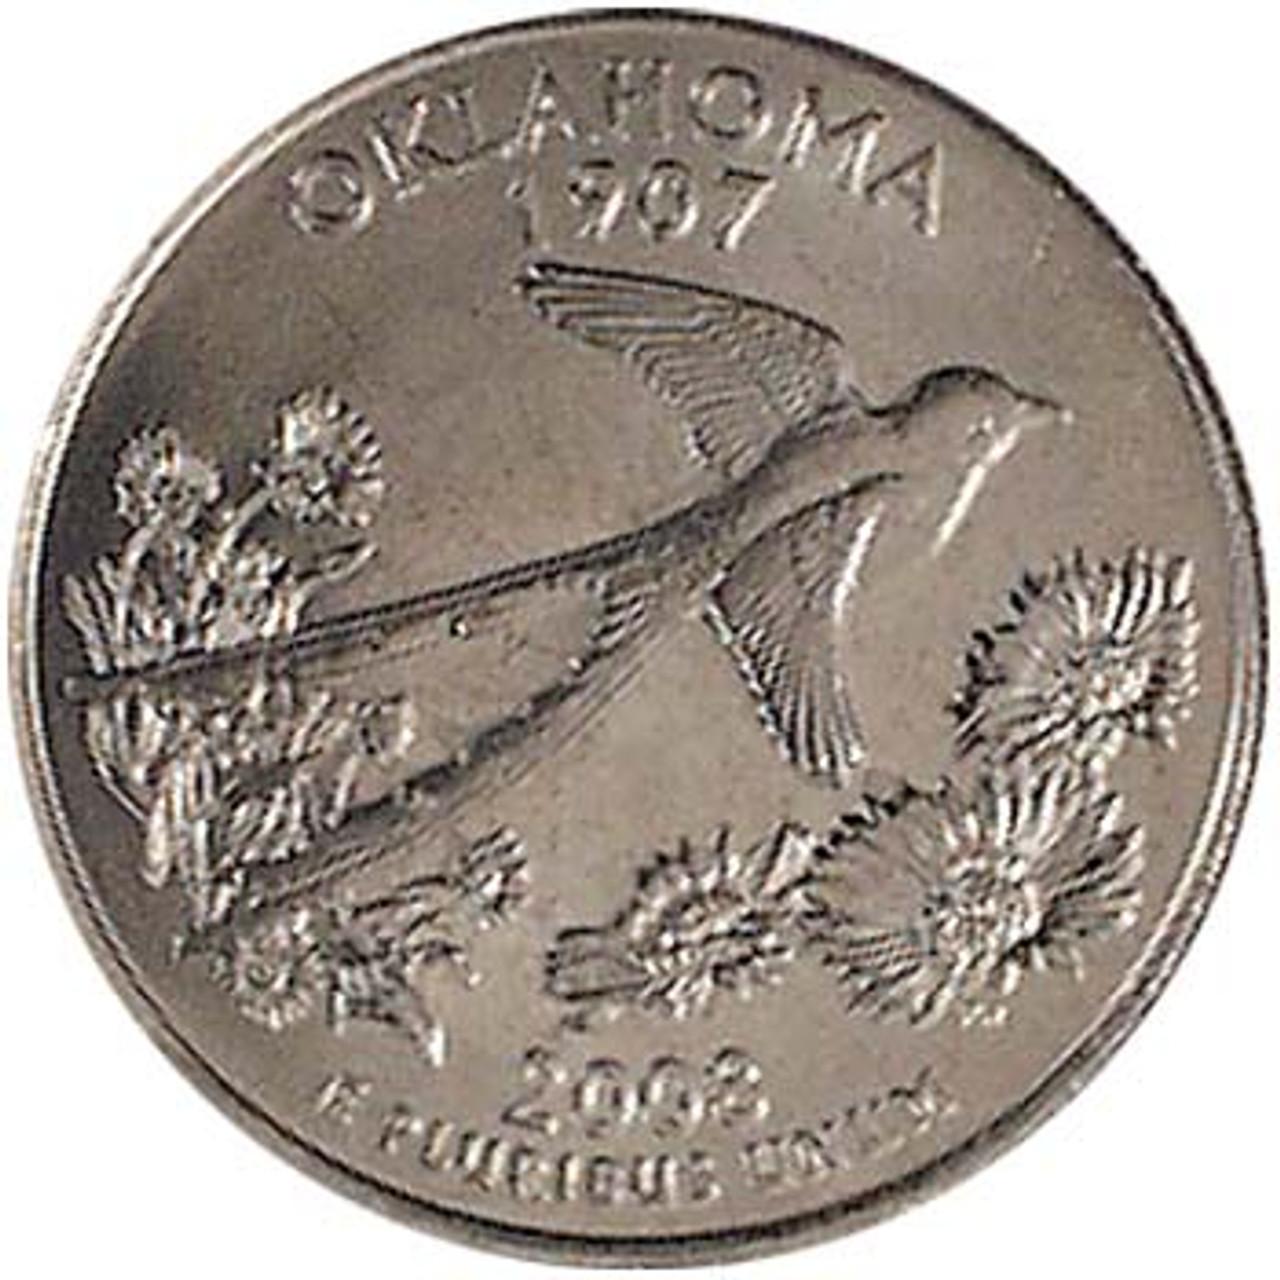 2008-D Oklahoma Quarter Brilliant Uncirculated Image 1